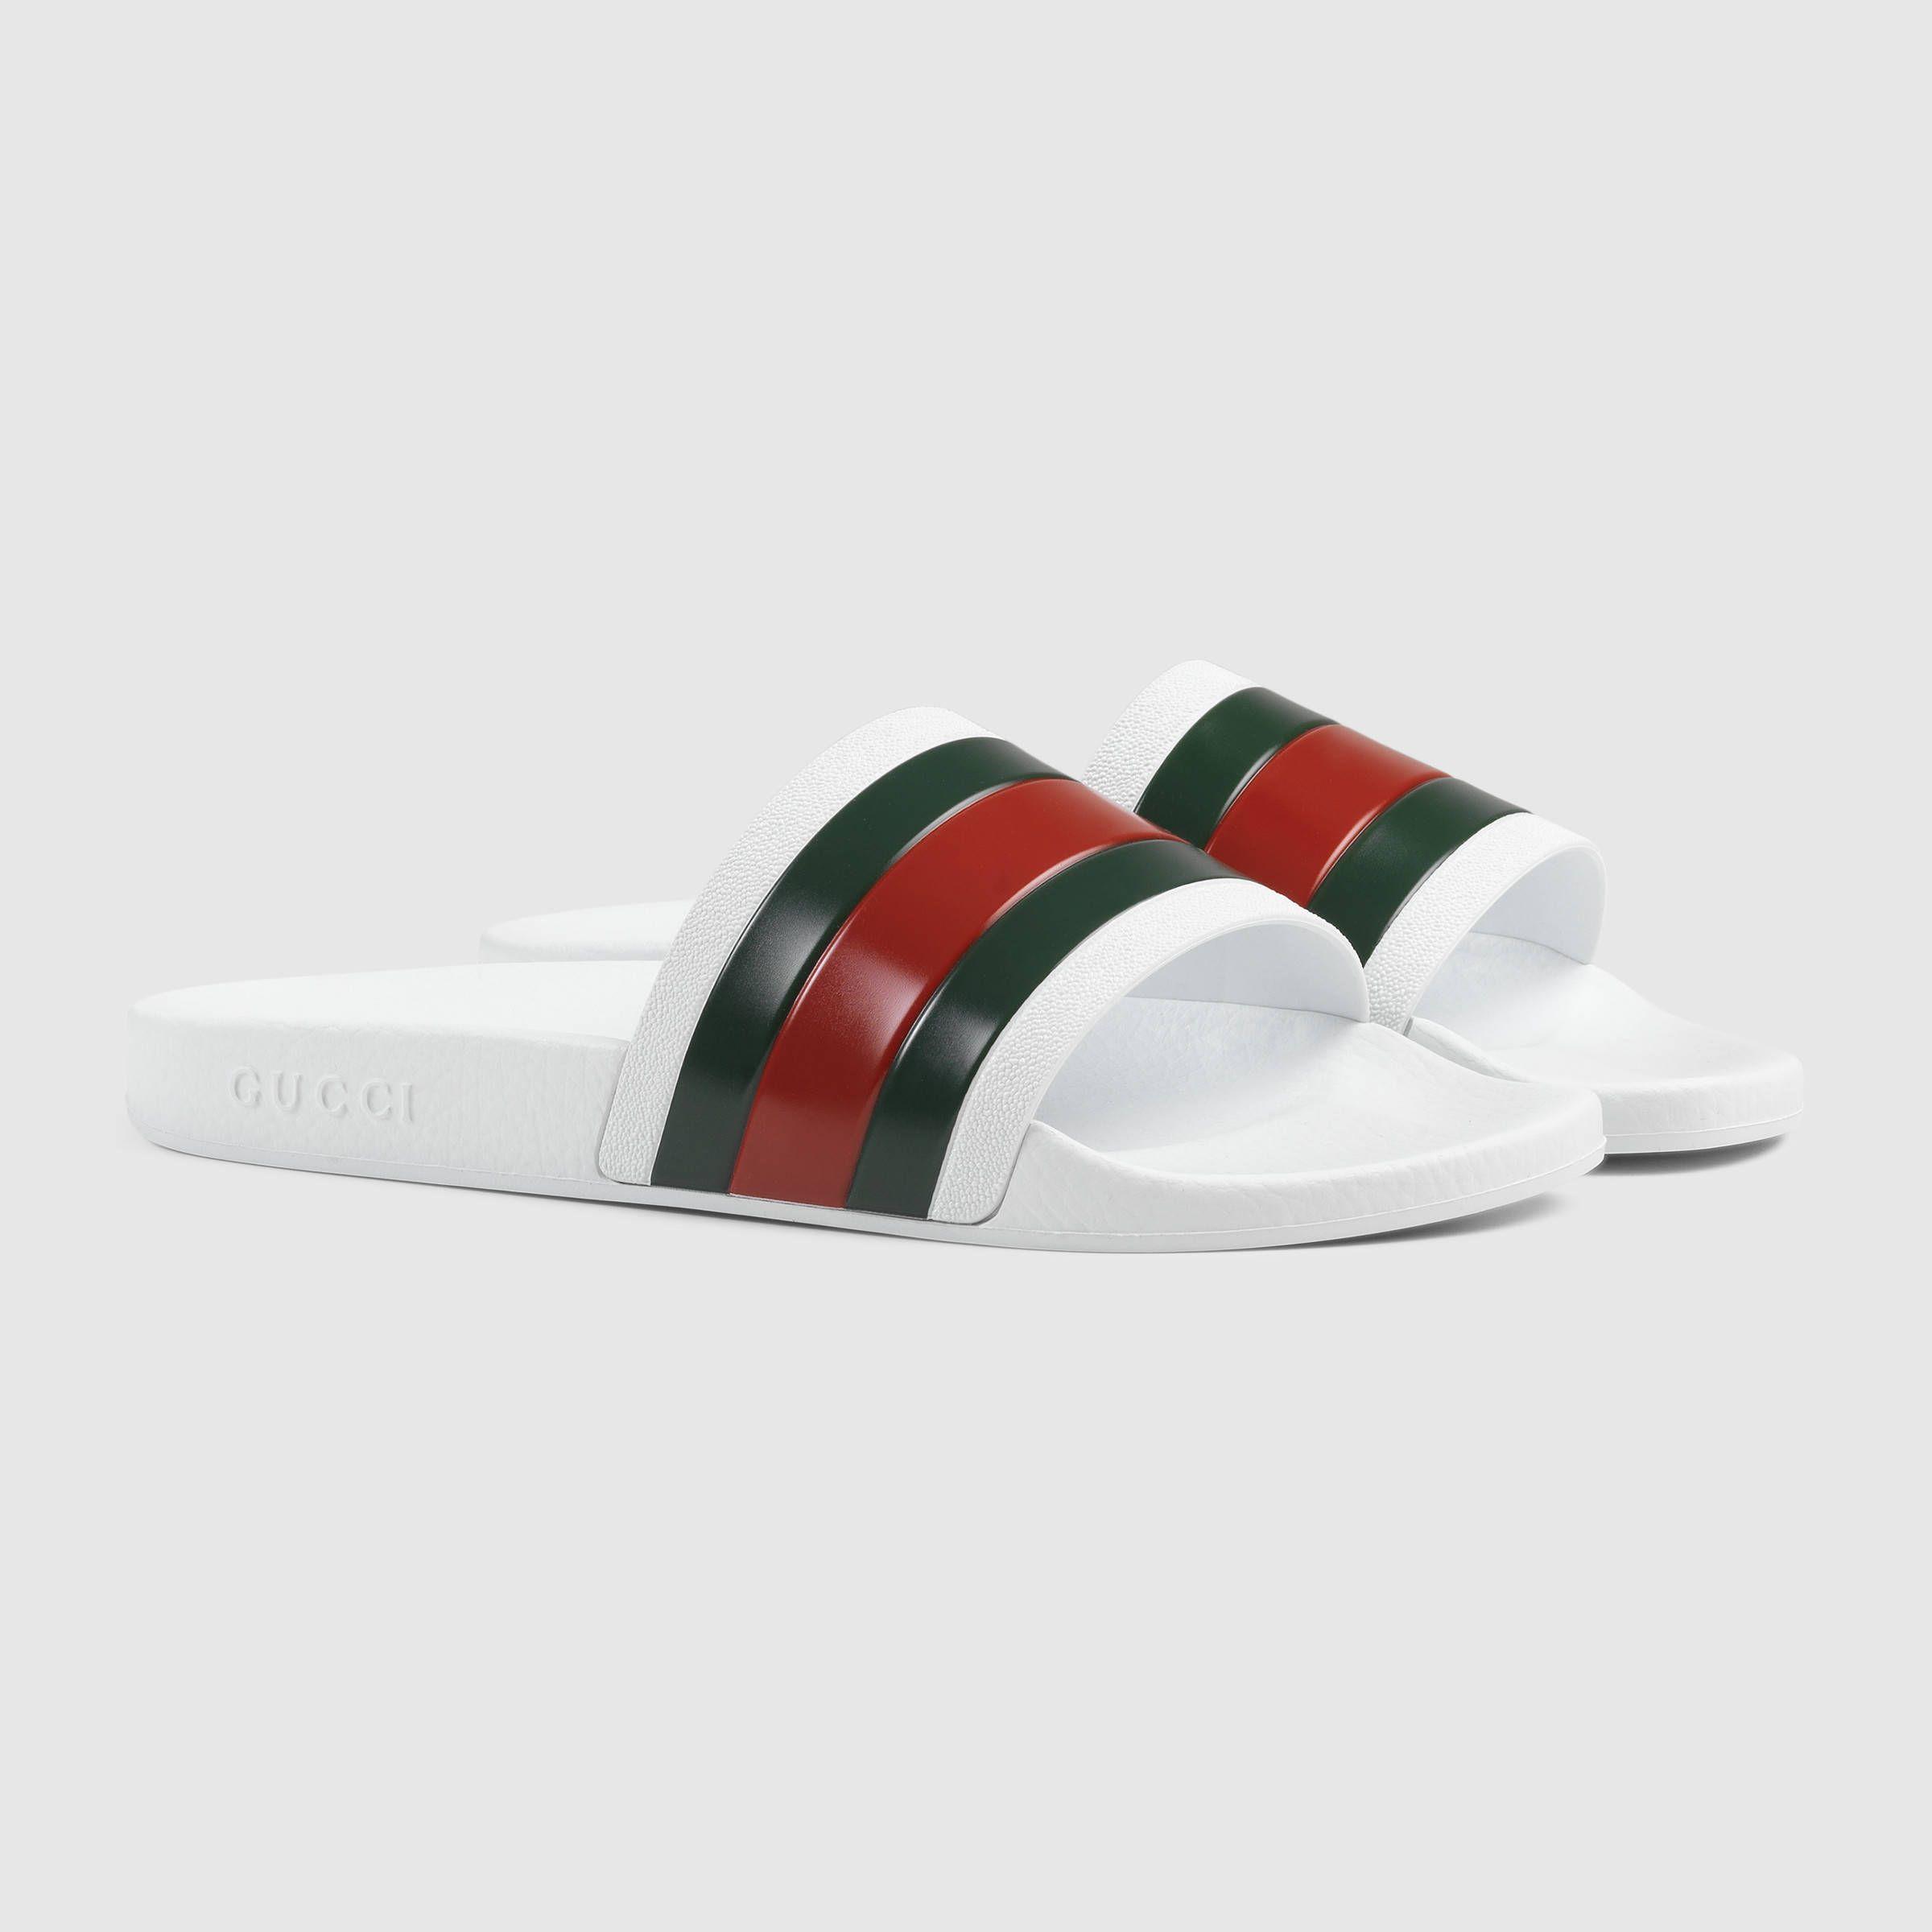 Black gucci sandals - Gucci Men Rubber Slide Sandal 160